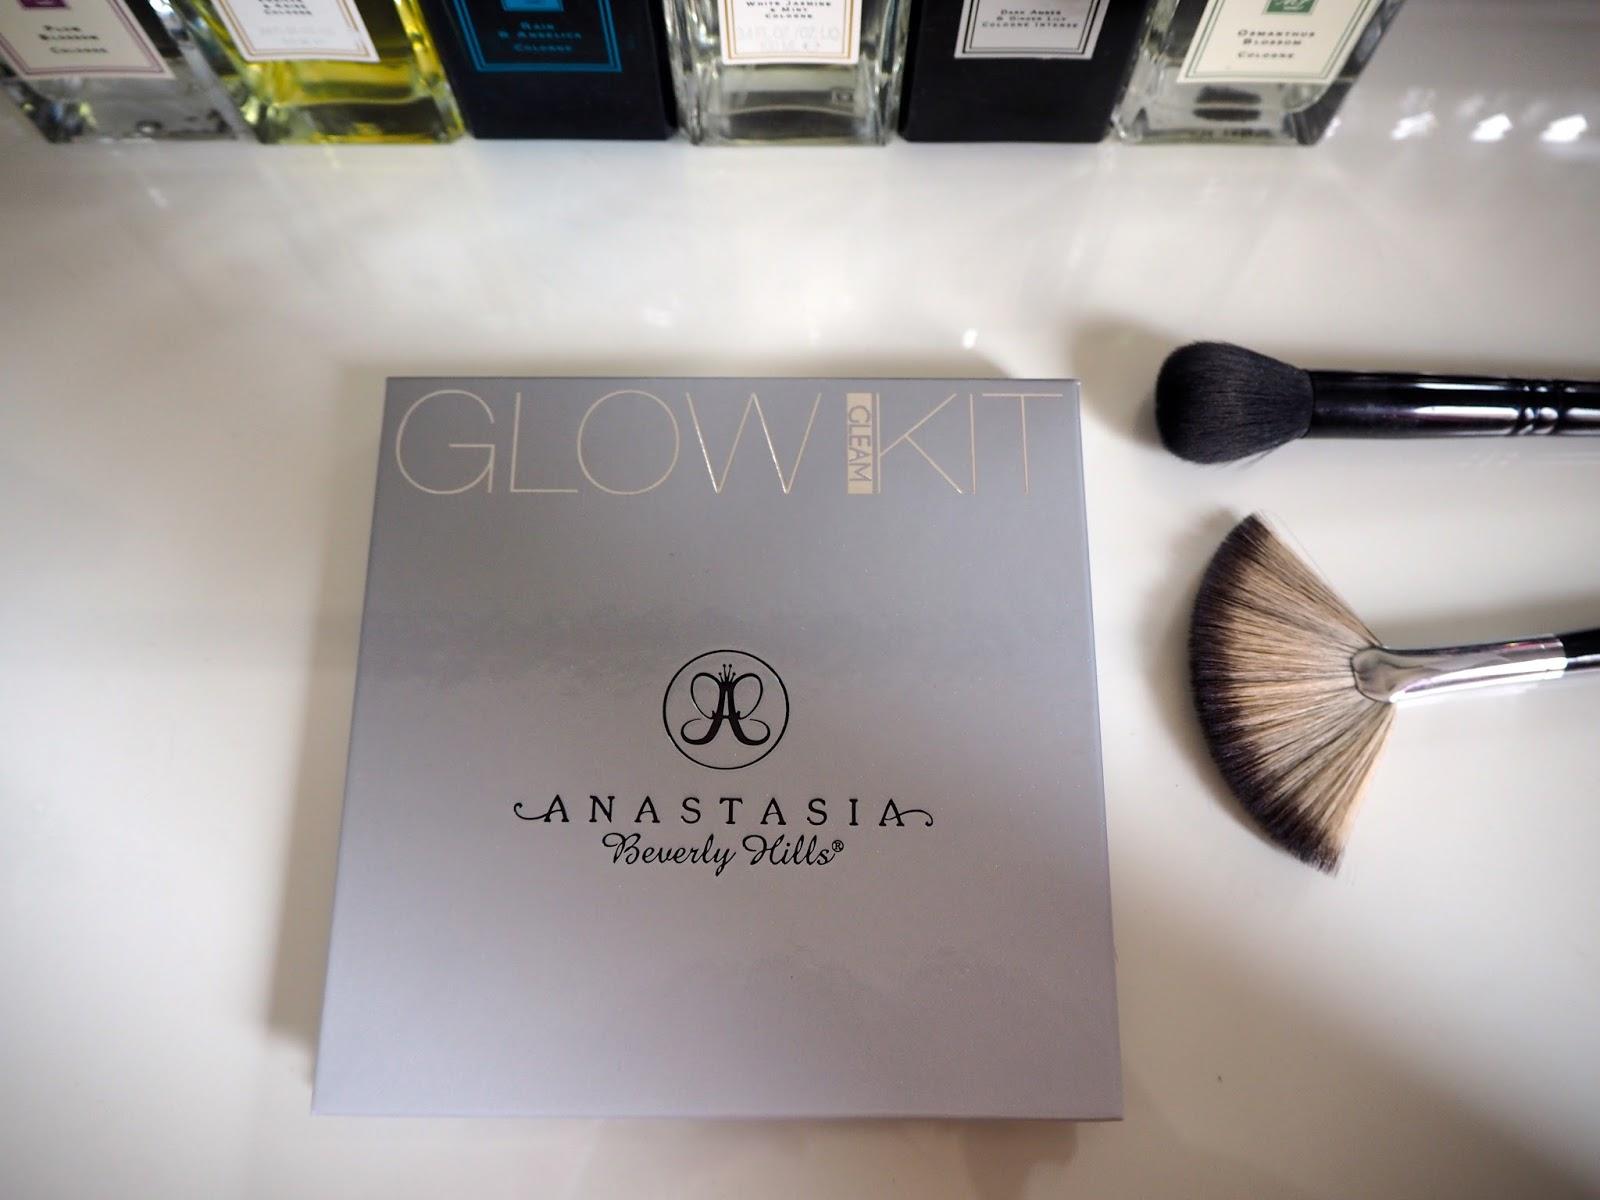 Anastasia Glow Kit in Gleam review